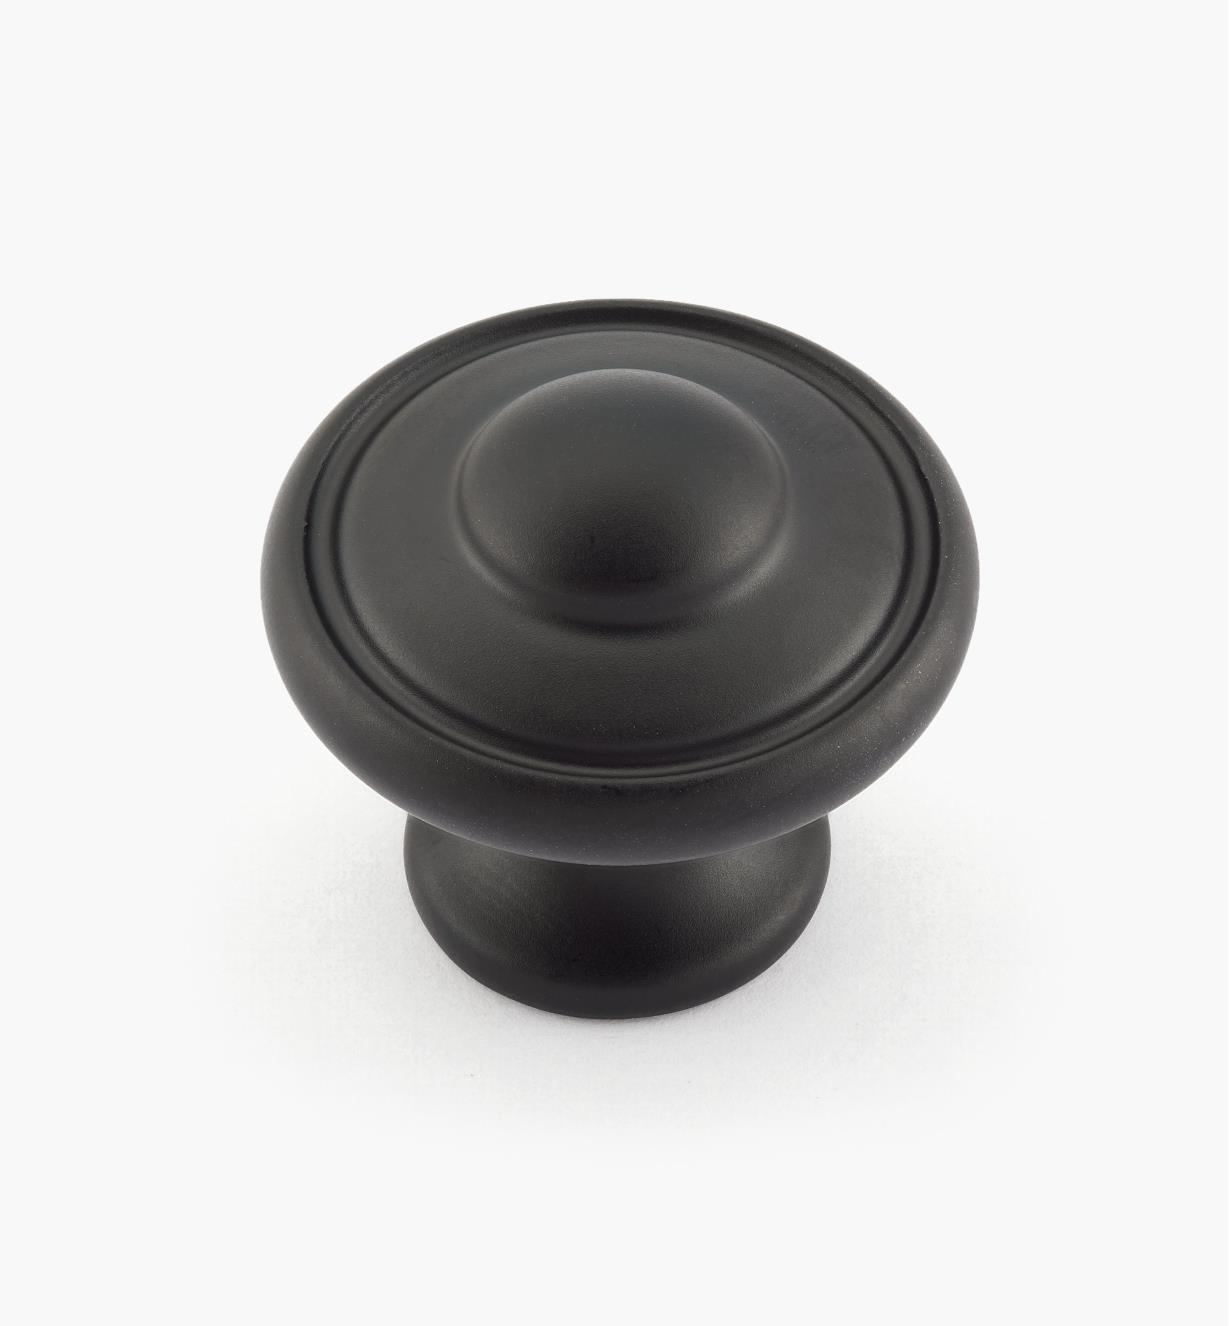 02G1801 - Bouton Euro Traditions de 1 3/16 po x 1 1/16 po, fini noir mat